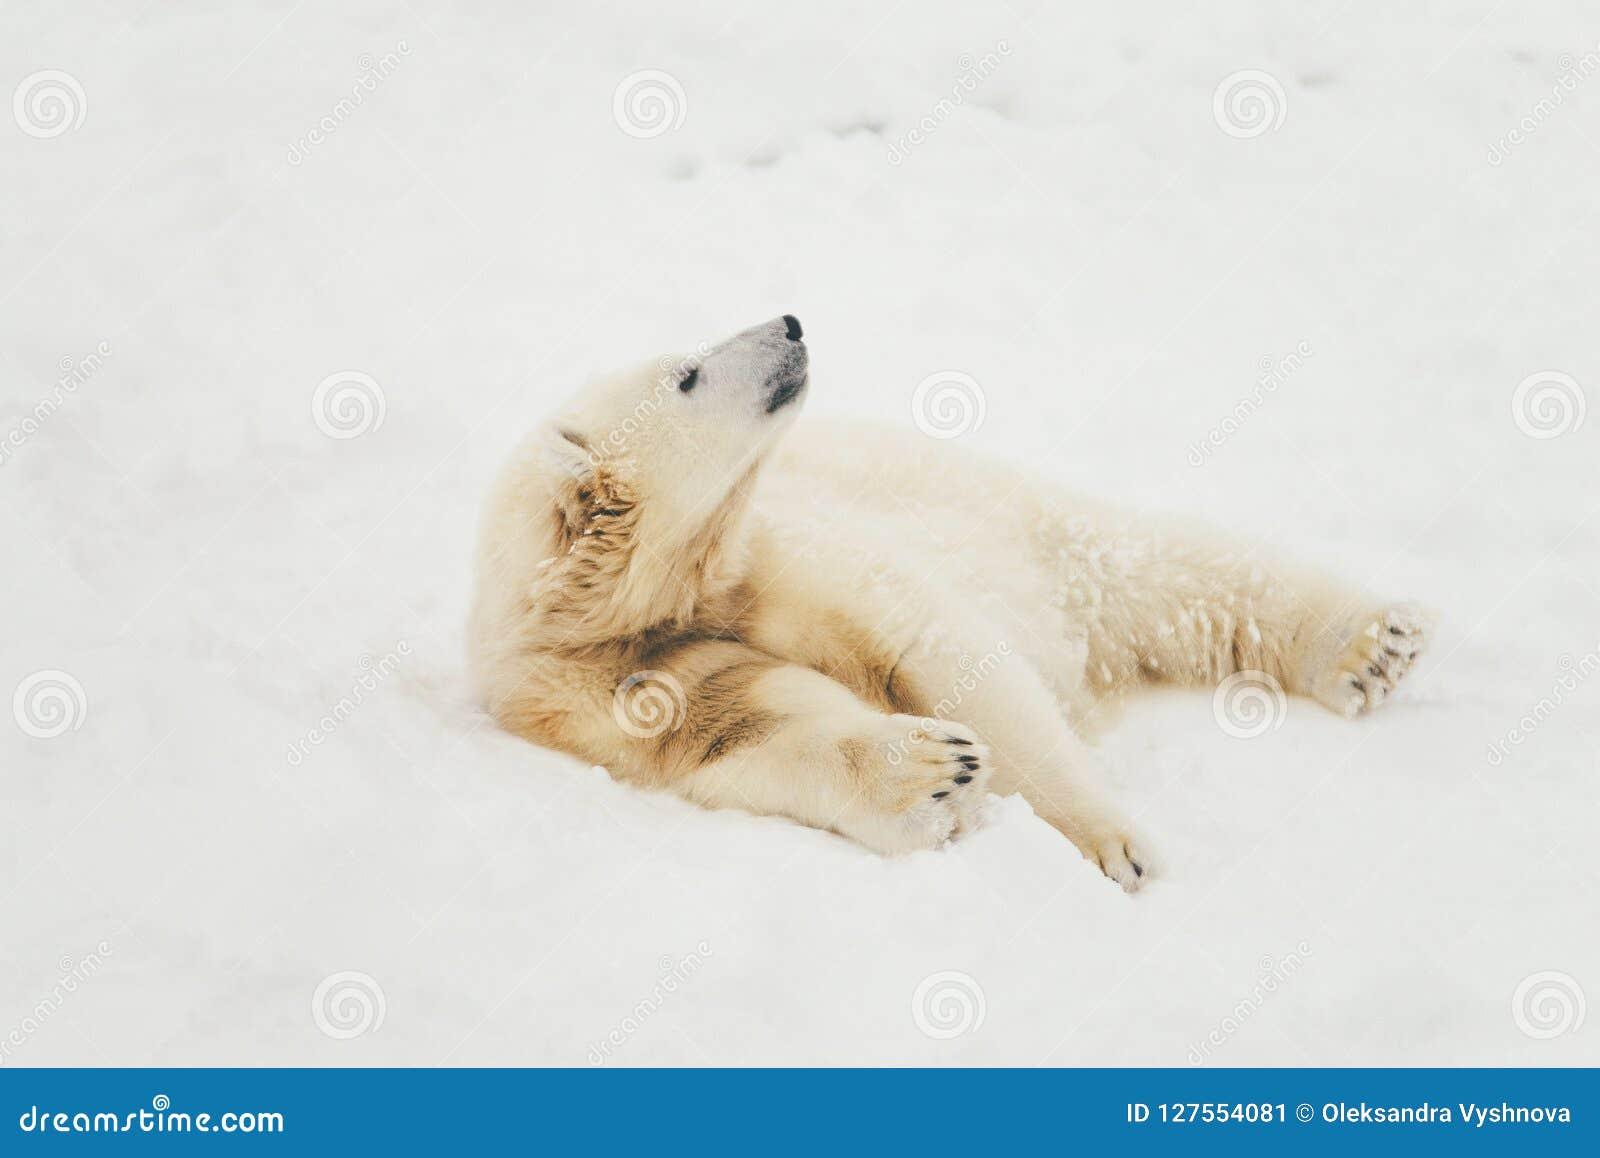 White polar bear in snow forest